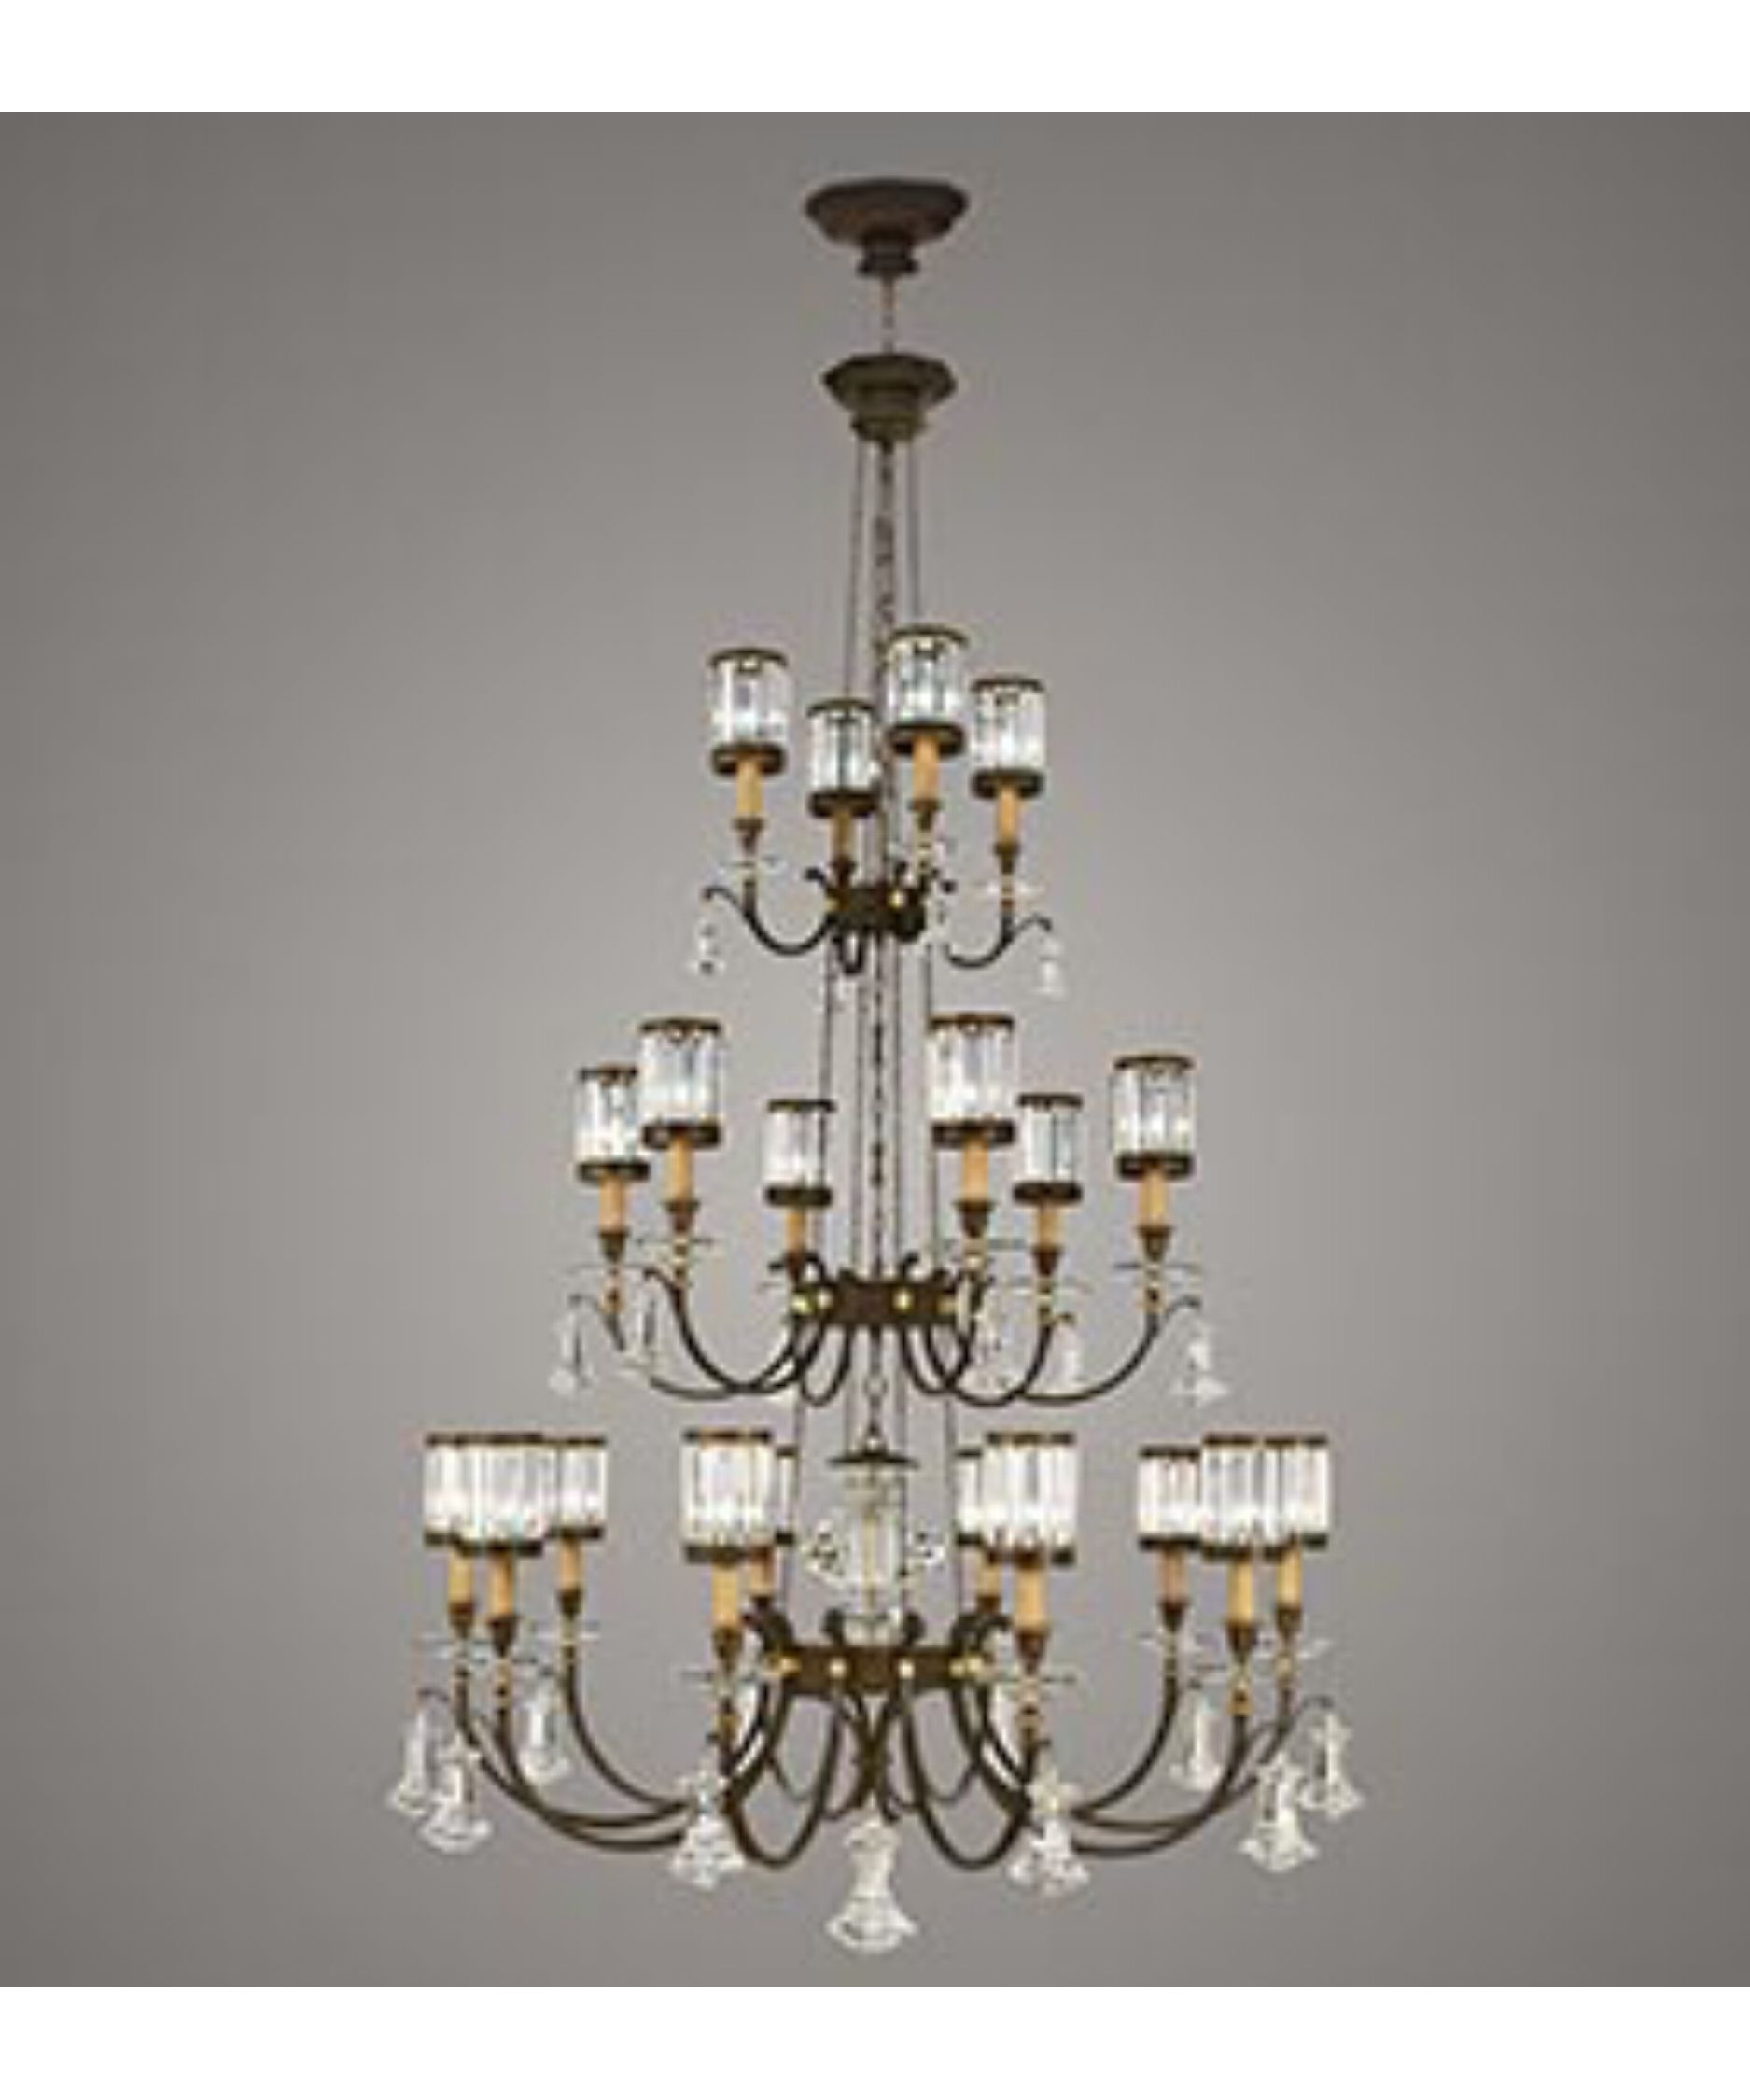 Eaton Place 52 Inch 20 Light Chandelier By Fine Art Lamps